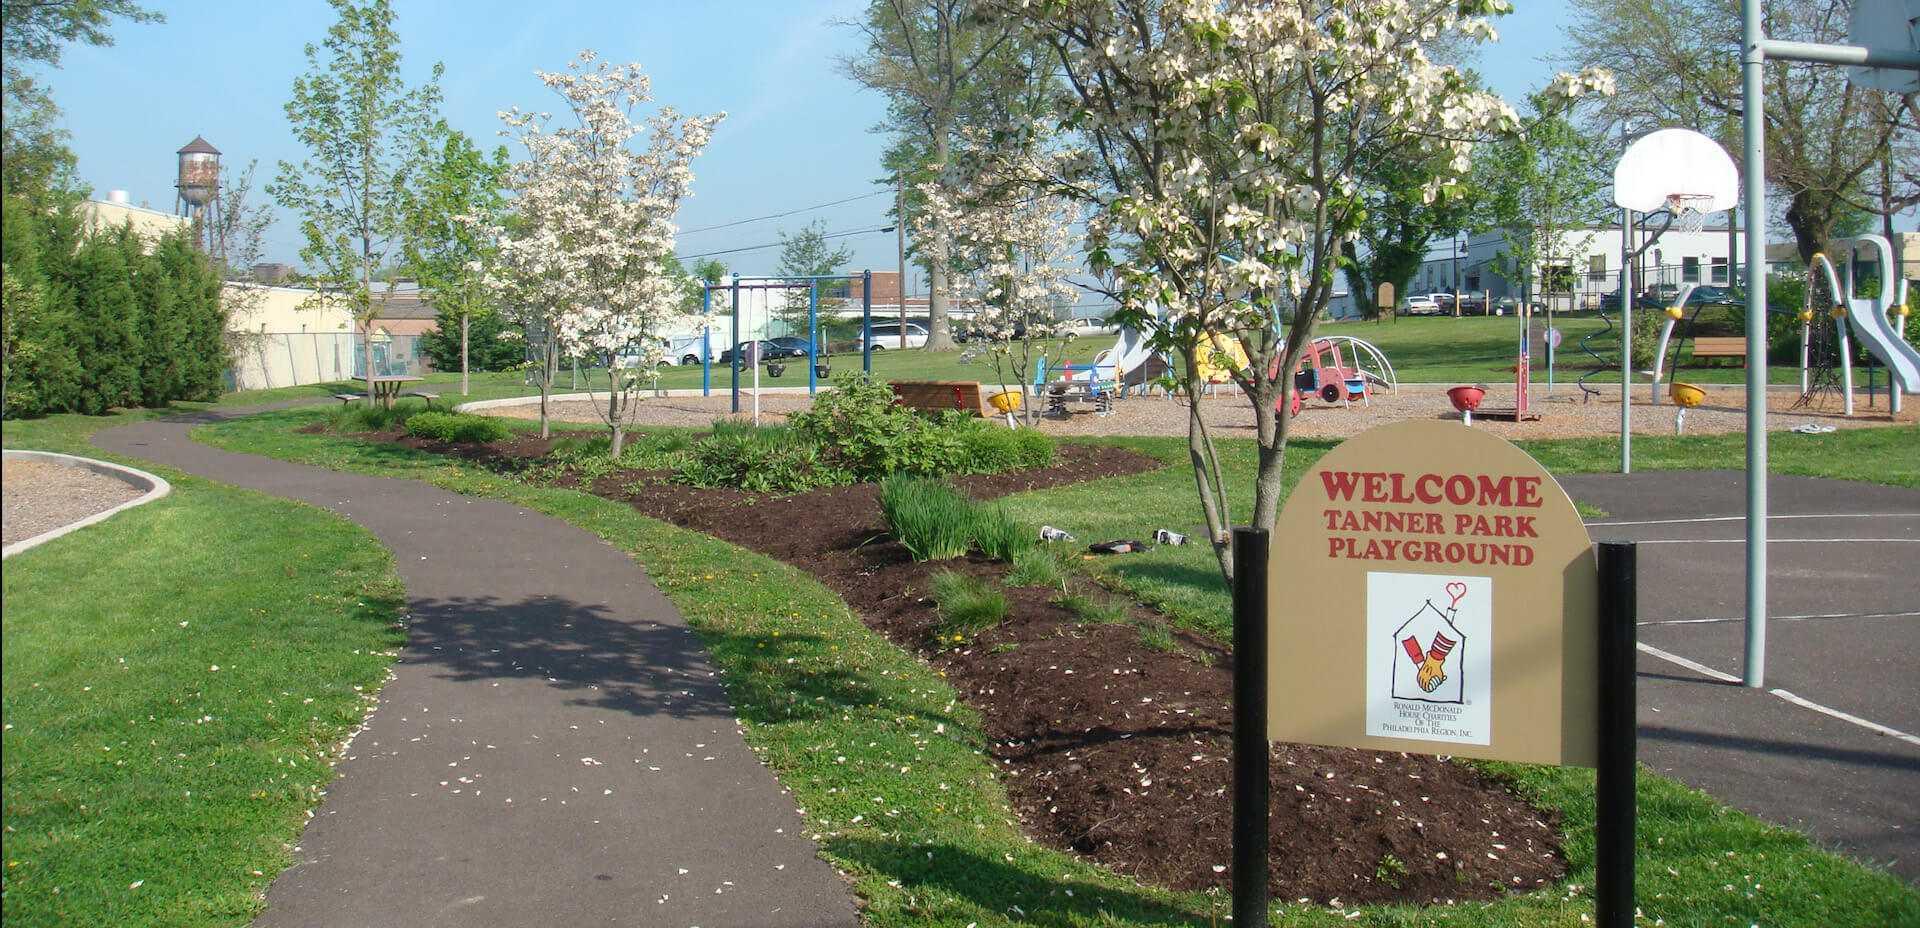 Tanner Park Community catharine ann farnen landscape architecting